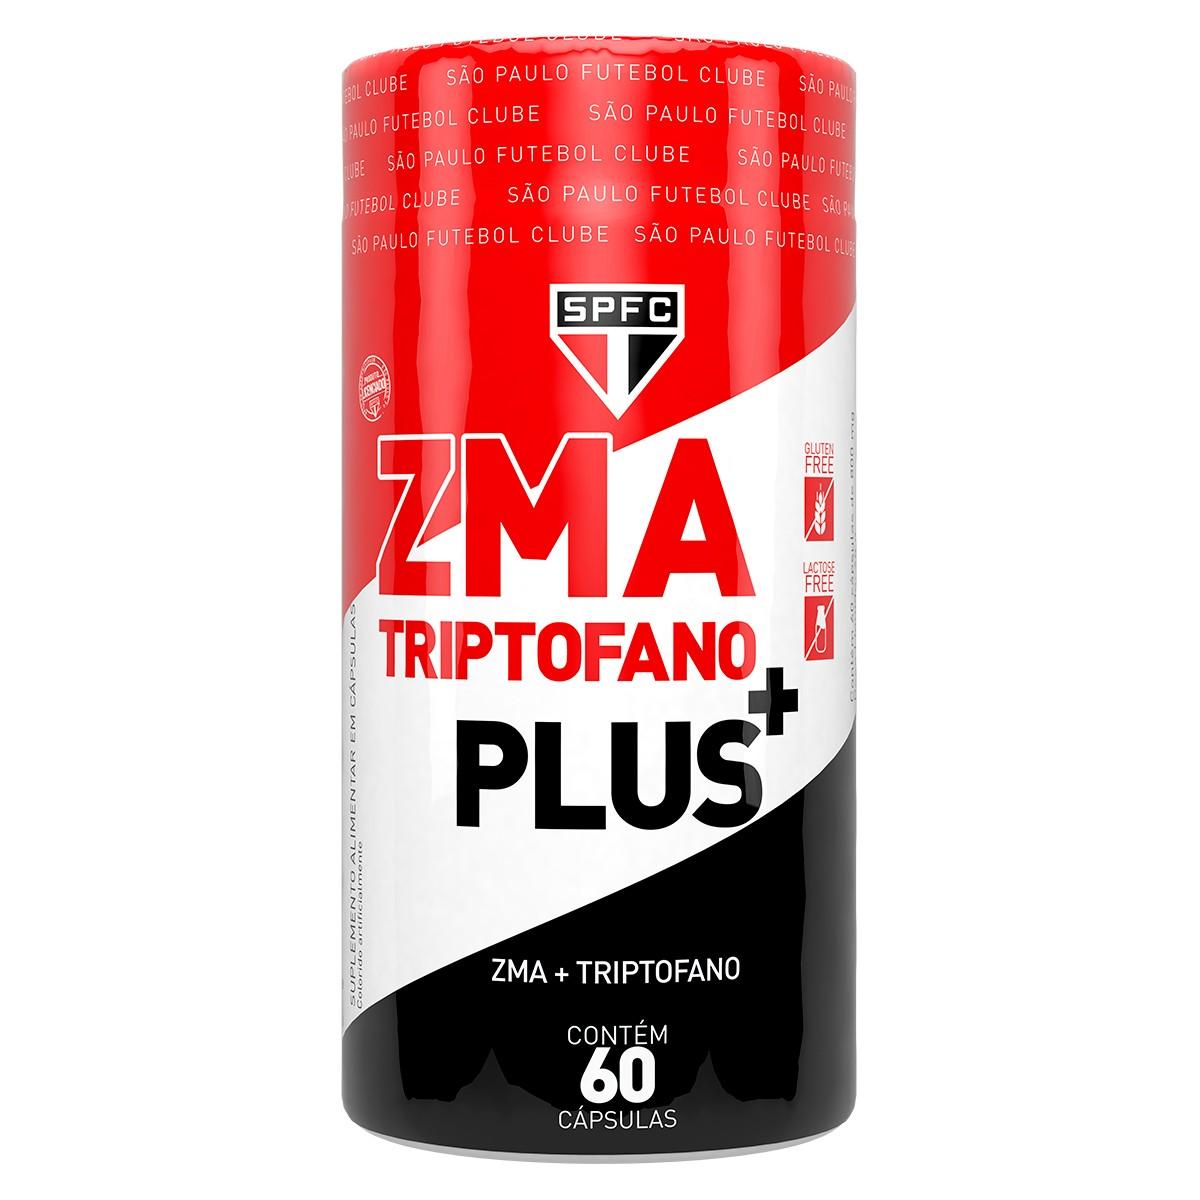 SPFC ZMA Triptofano Plus 60 Cápsulas - Forster Nutrition